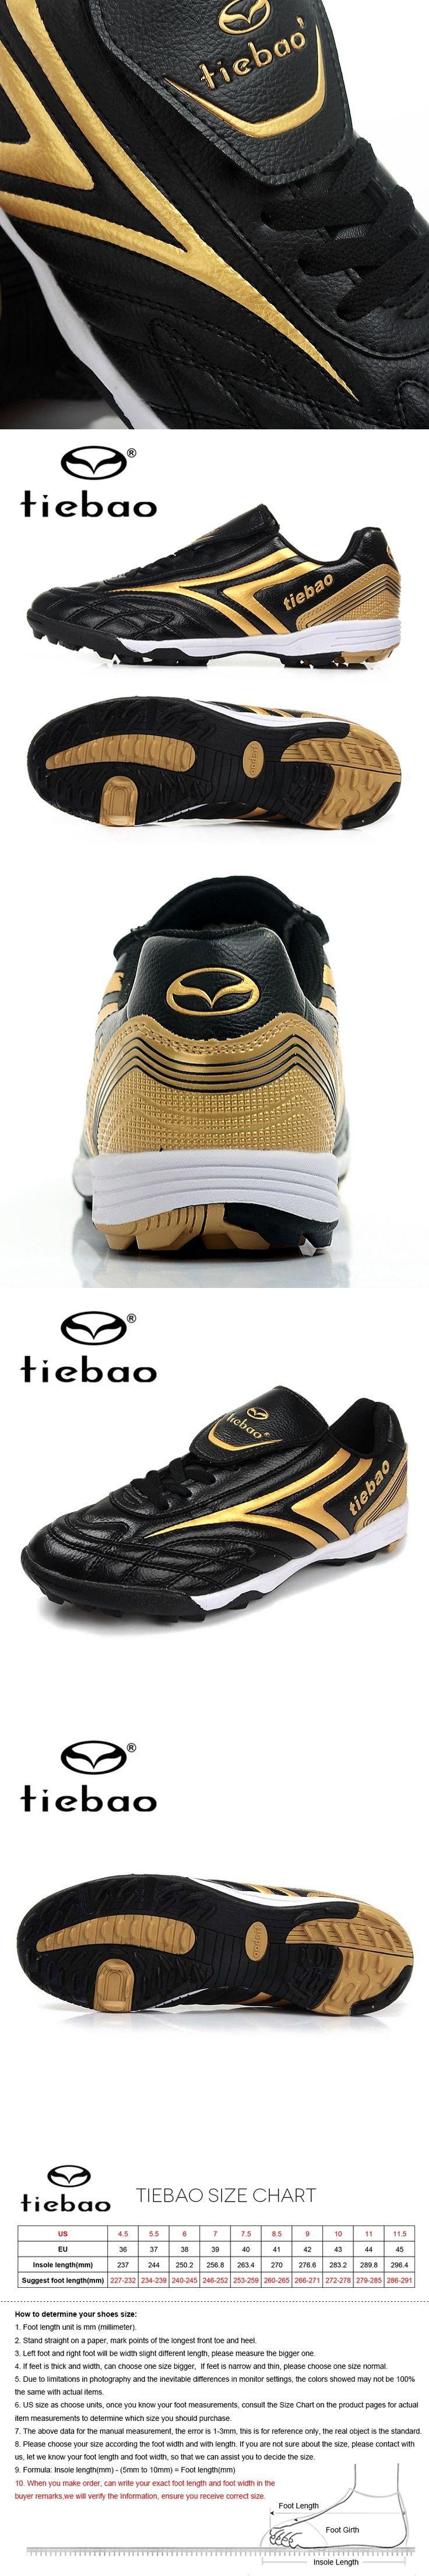 TIEBAO Professional TF Turf Soles Soccer Shoes Botas De Futbol Soccer Cleats Men Football Boots Athletic Training Sneakers